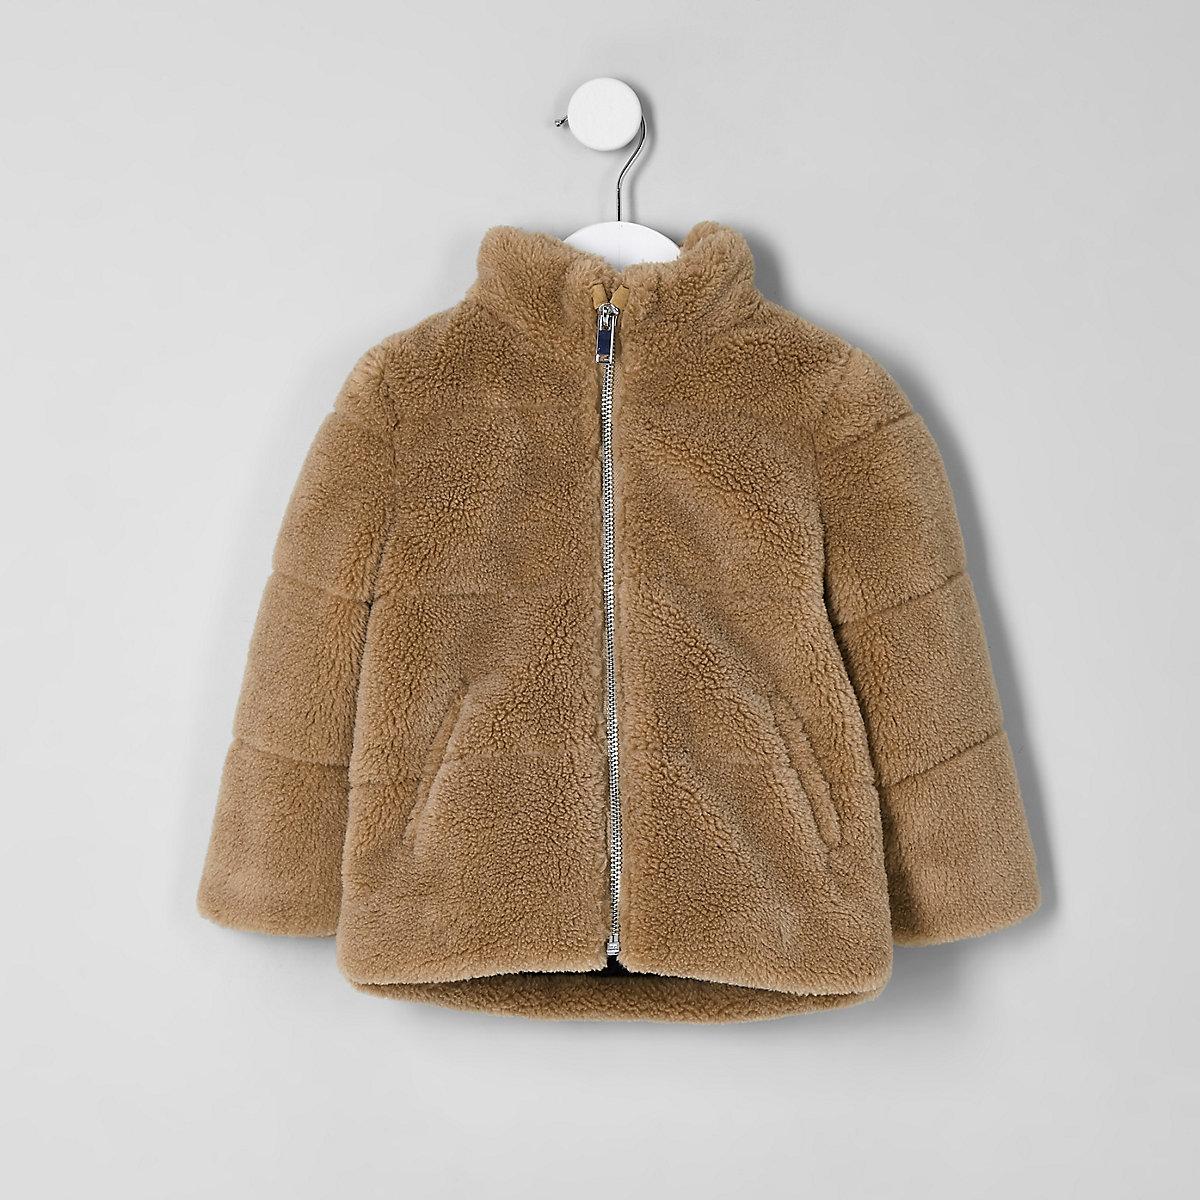 d43338b1d Mini boys brown borg puffer jacket - Baby Boys Coats   Jackets ...